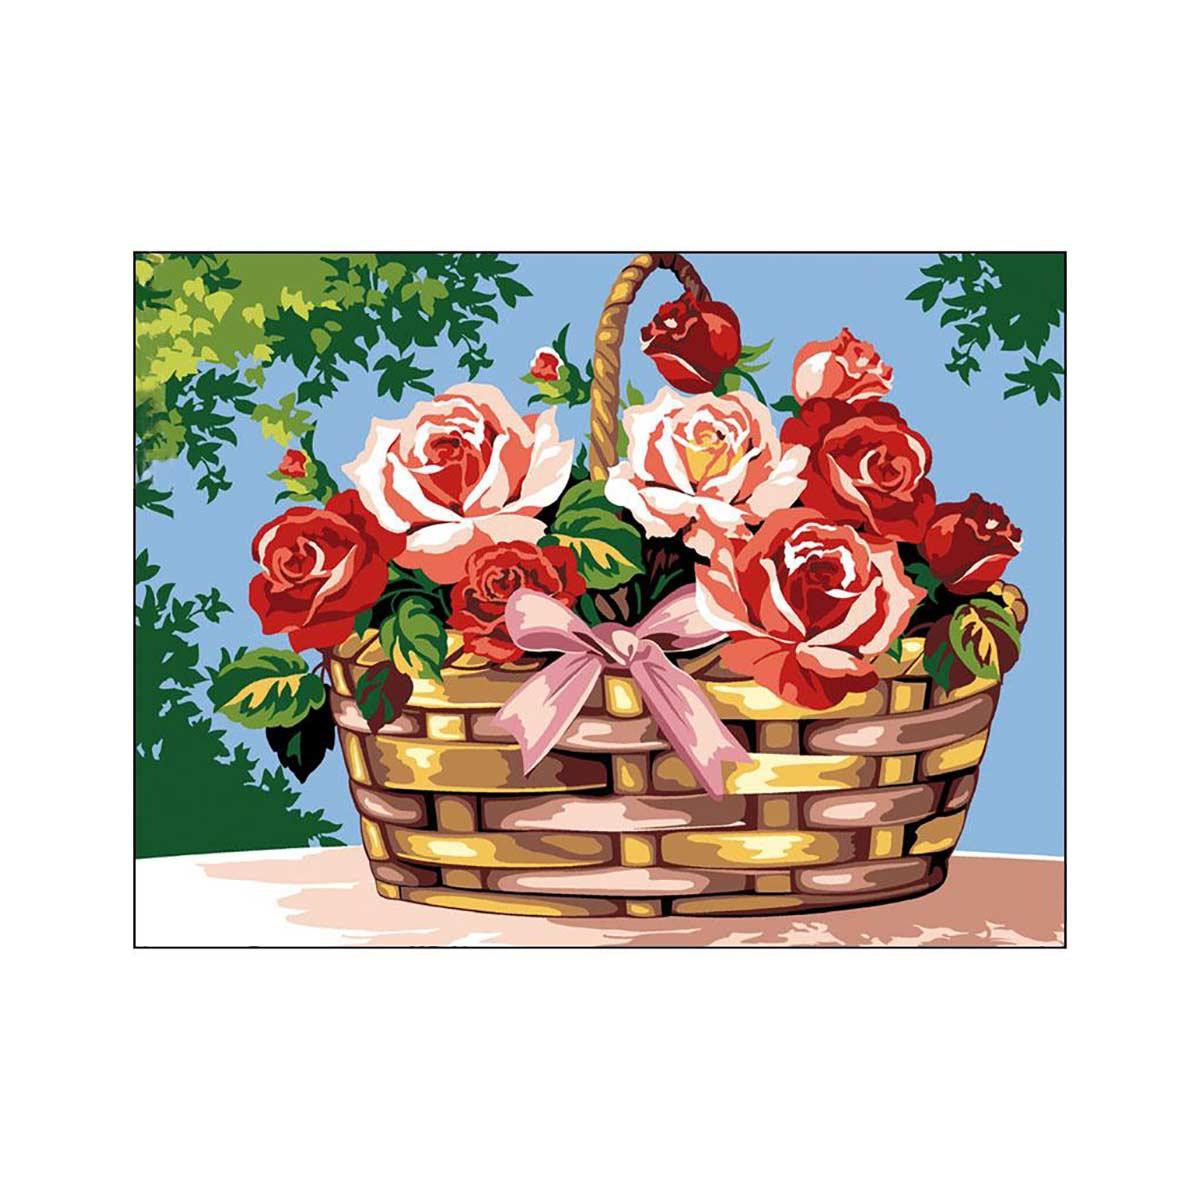 SE926-261 Канва с рисунком SEG de Paris 'Корзина роз' 40*50 см